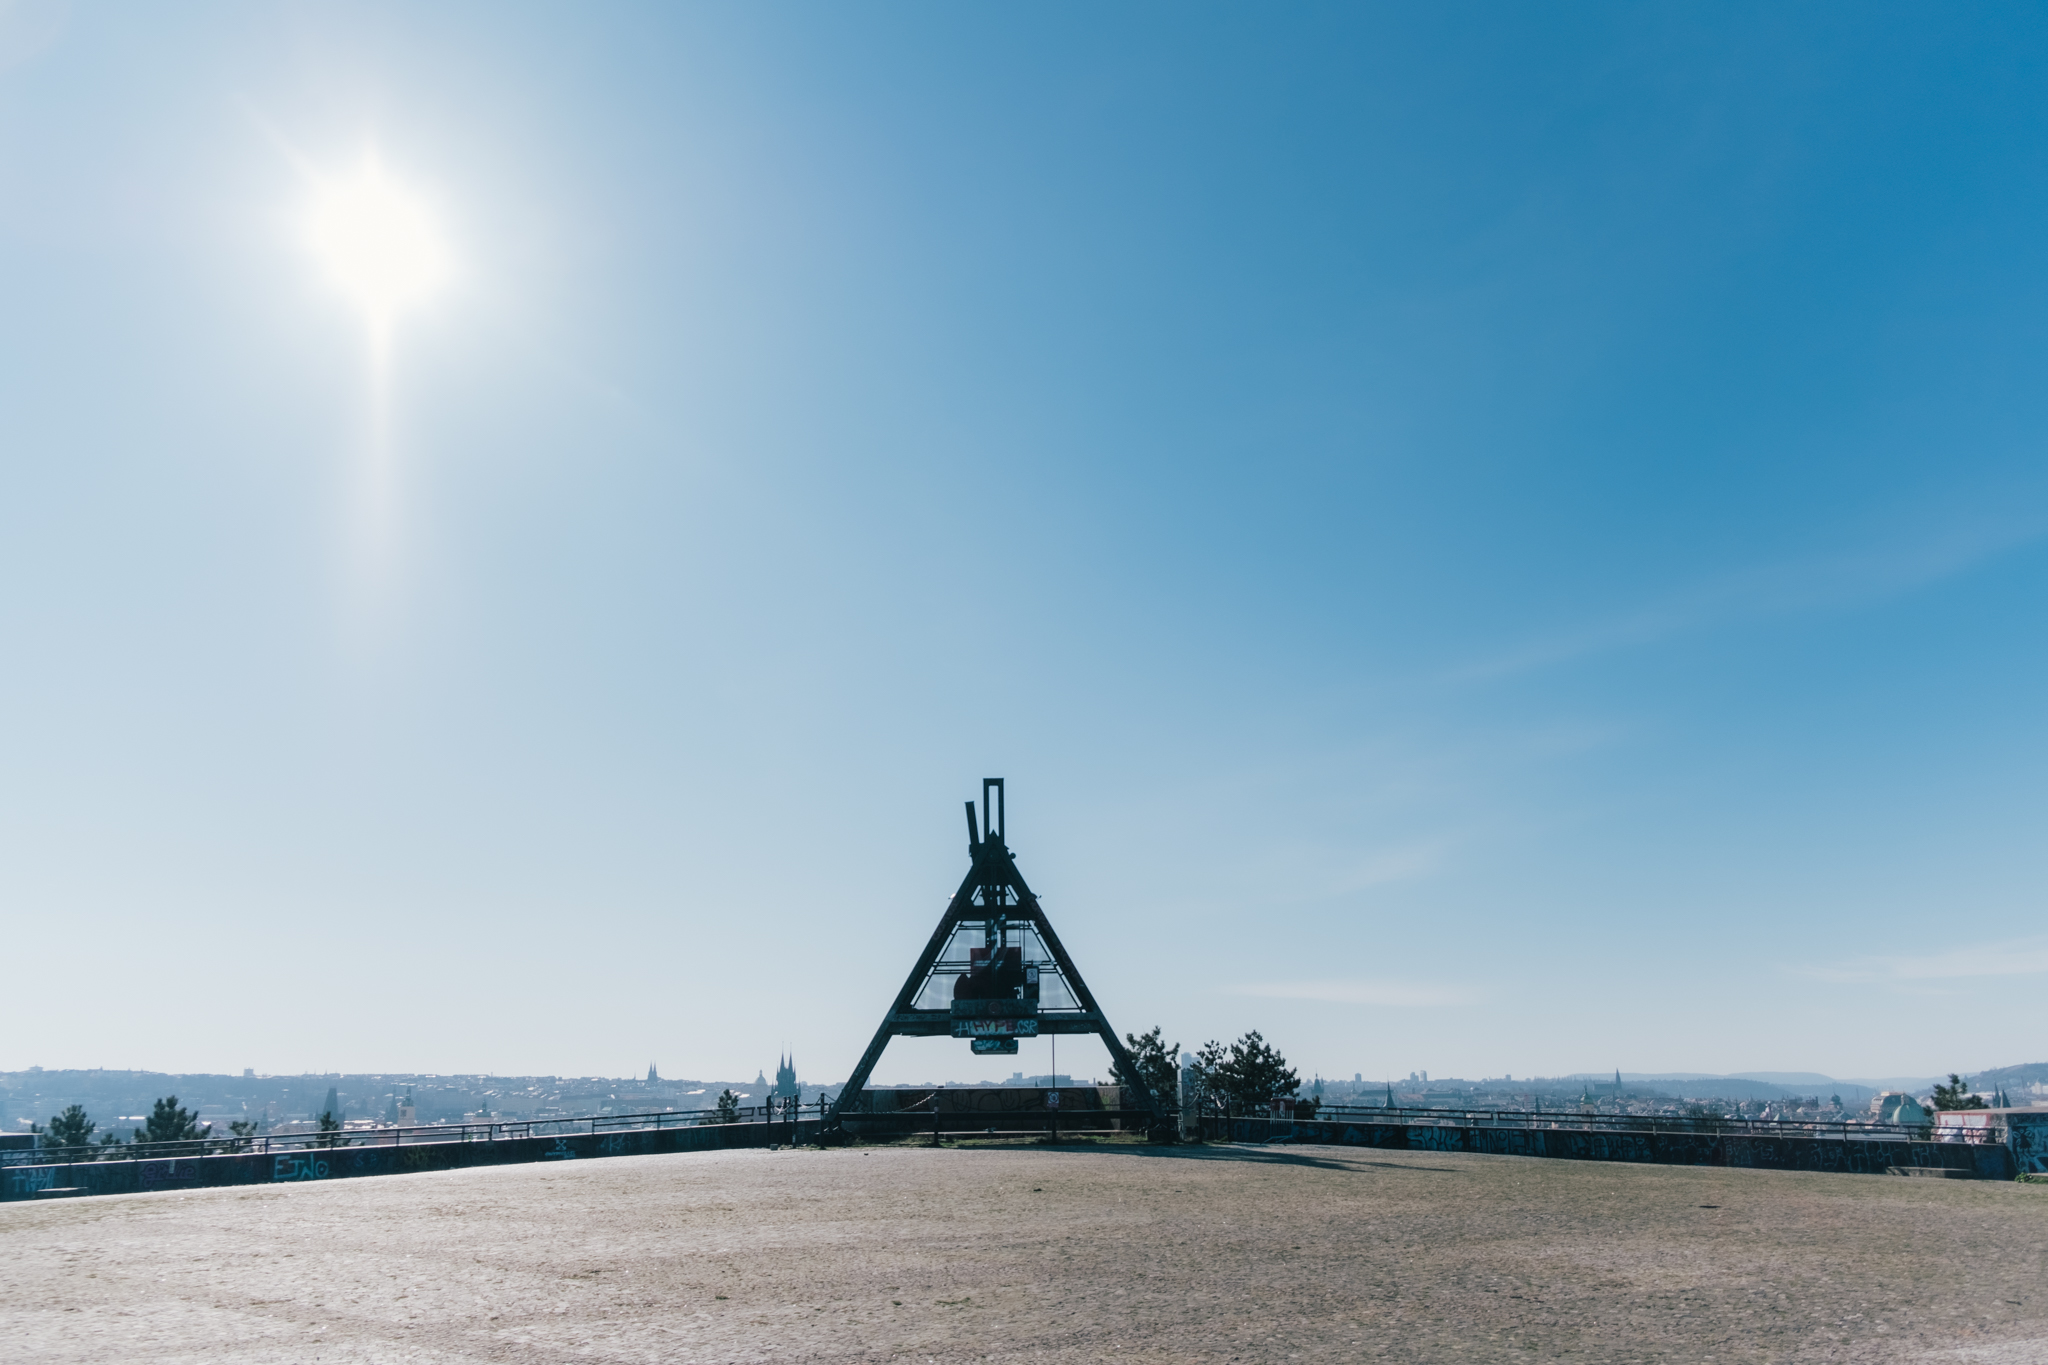 Prague Metronome (Stalin) without people